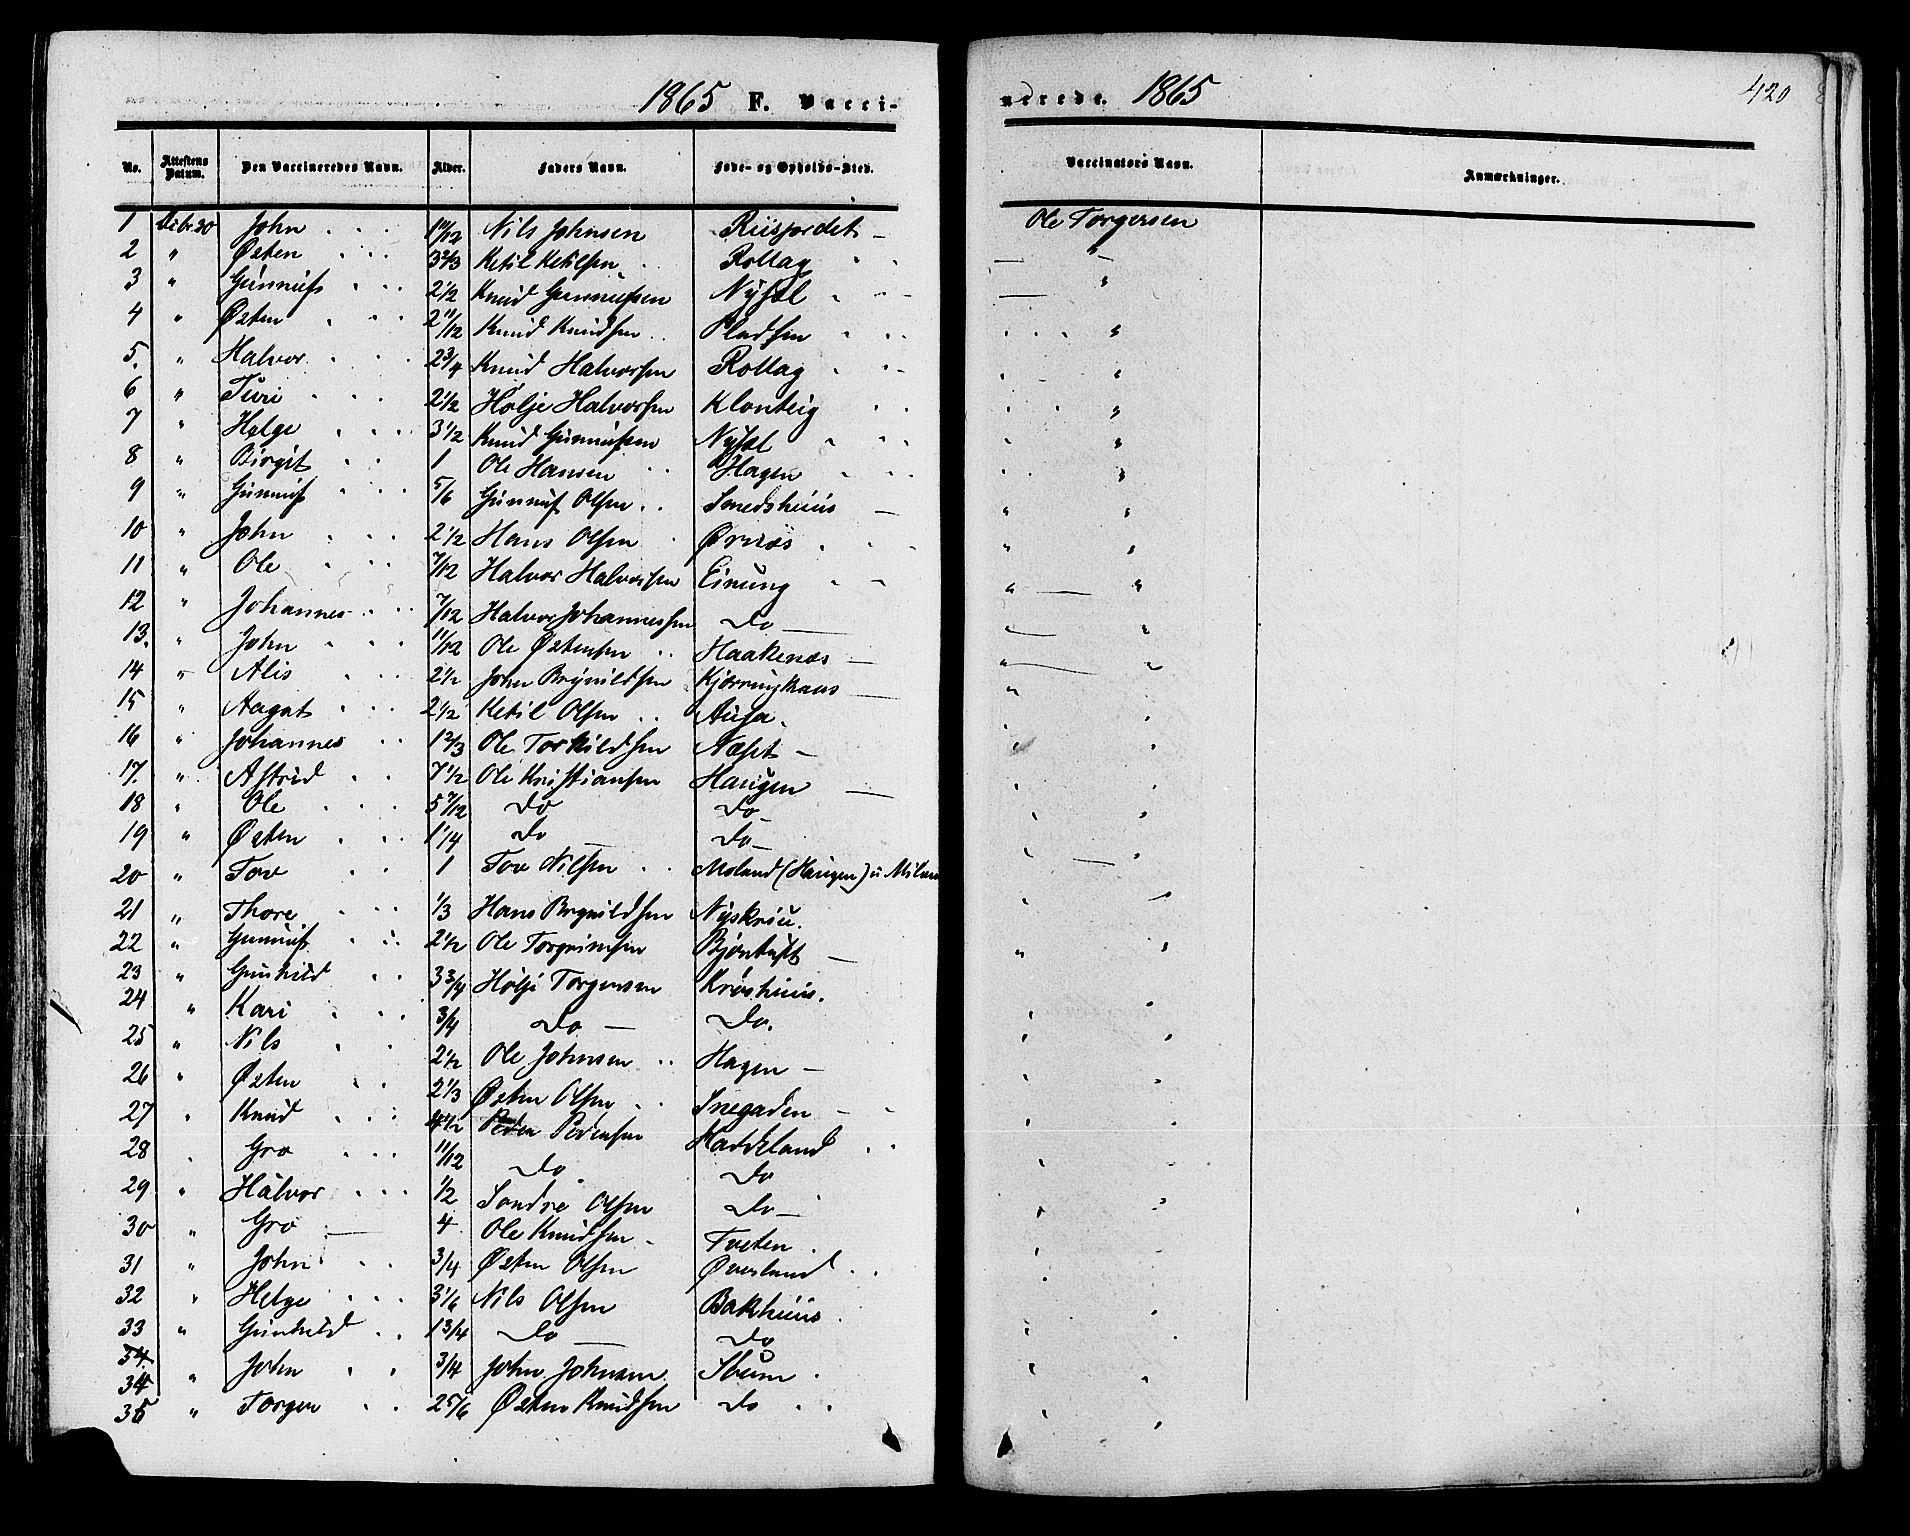 SAKO, Tinn kirkebøker, F/Fa/L0006: Ministerialbok nr. I 6, 1857-1878, s. 420